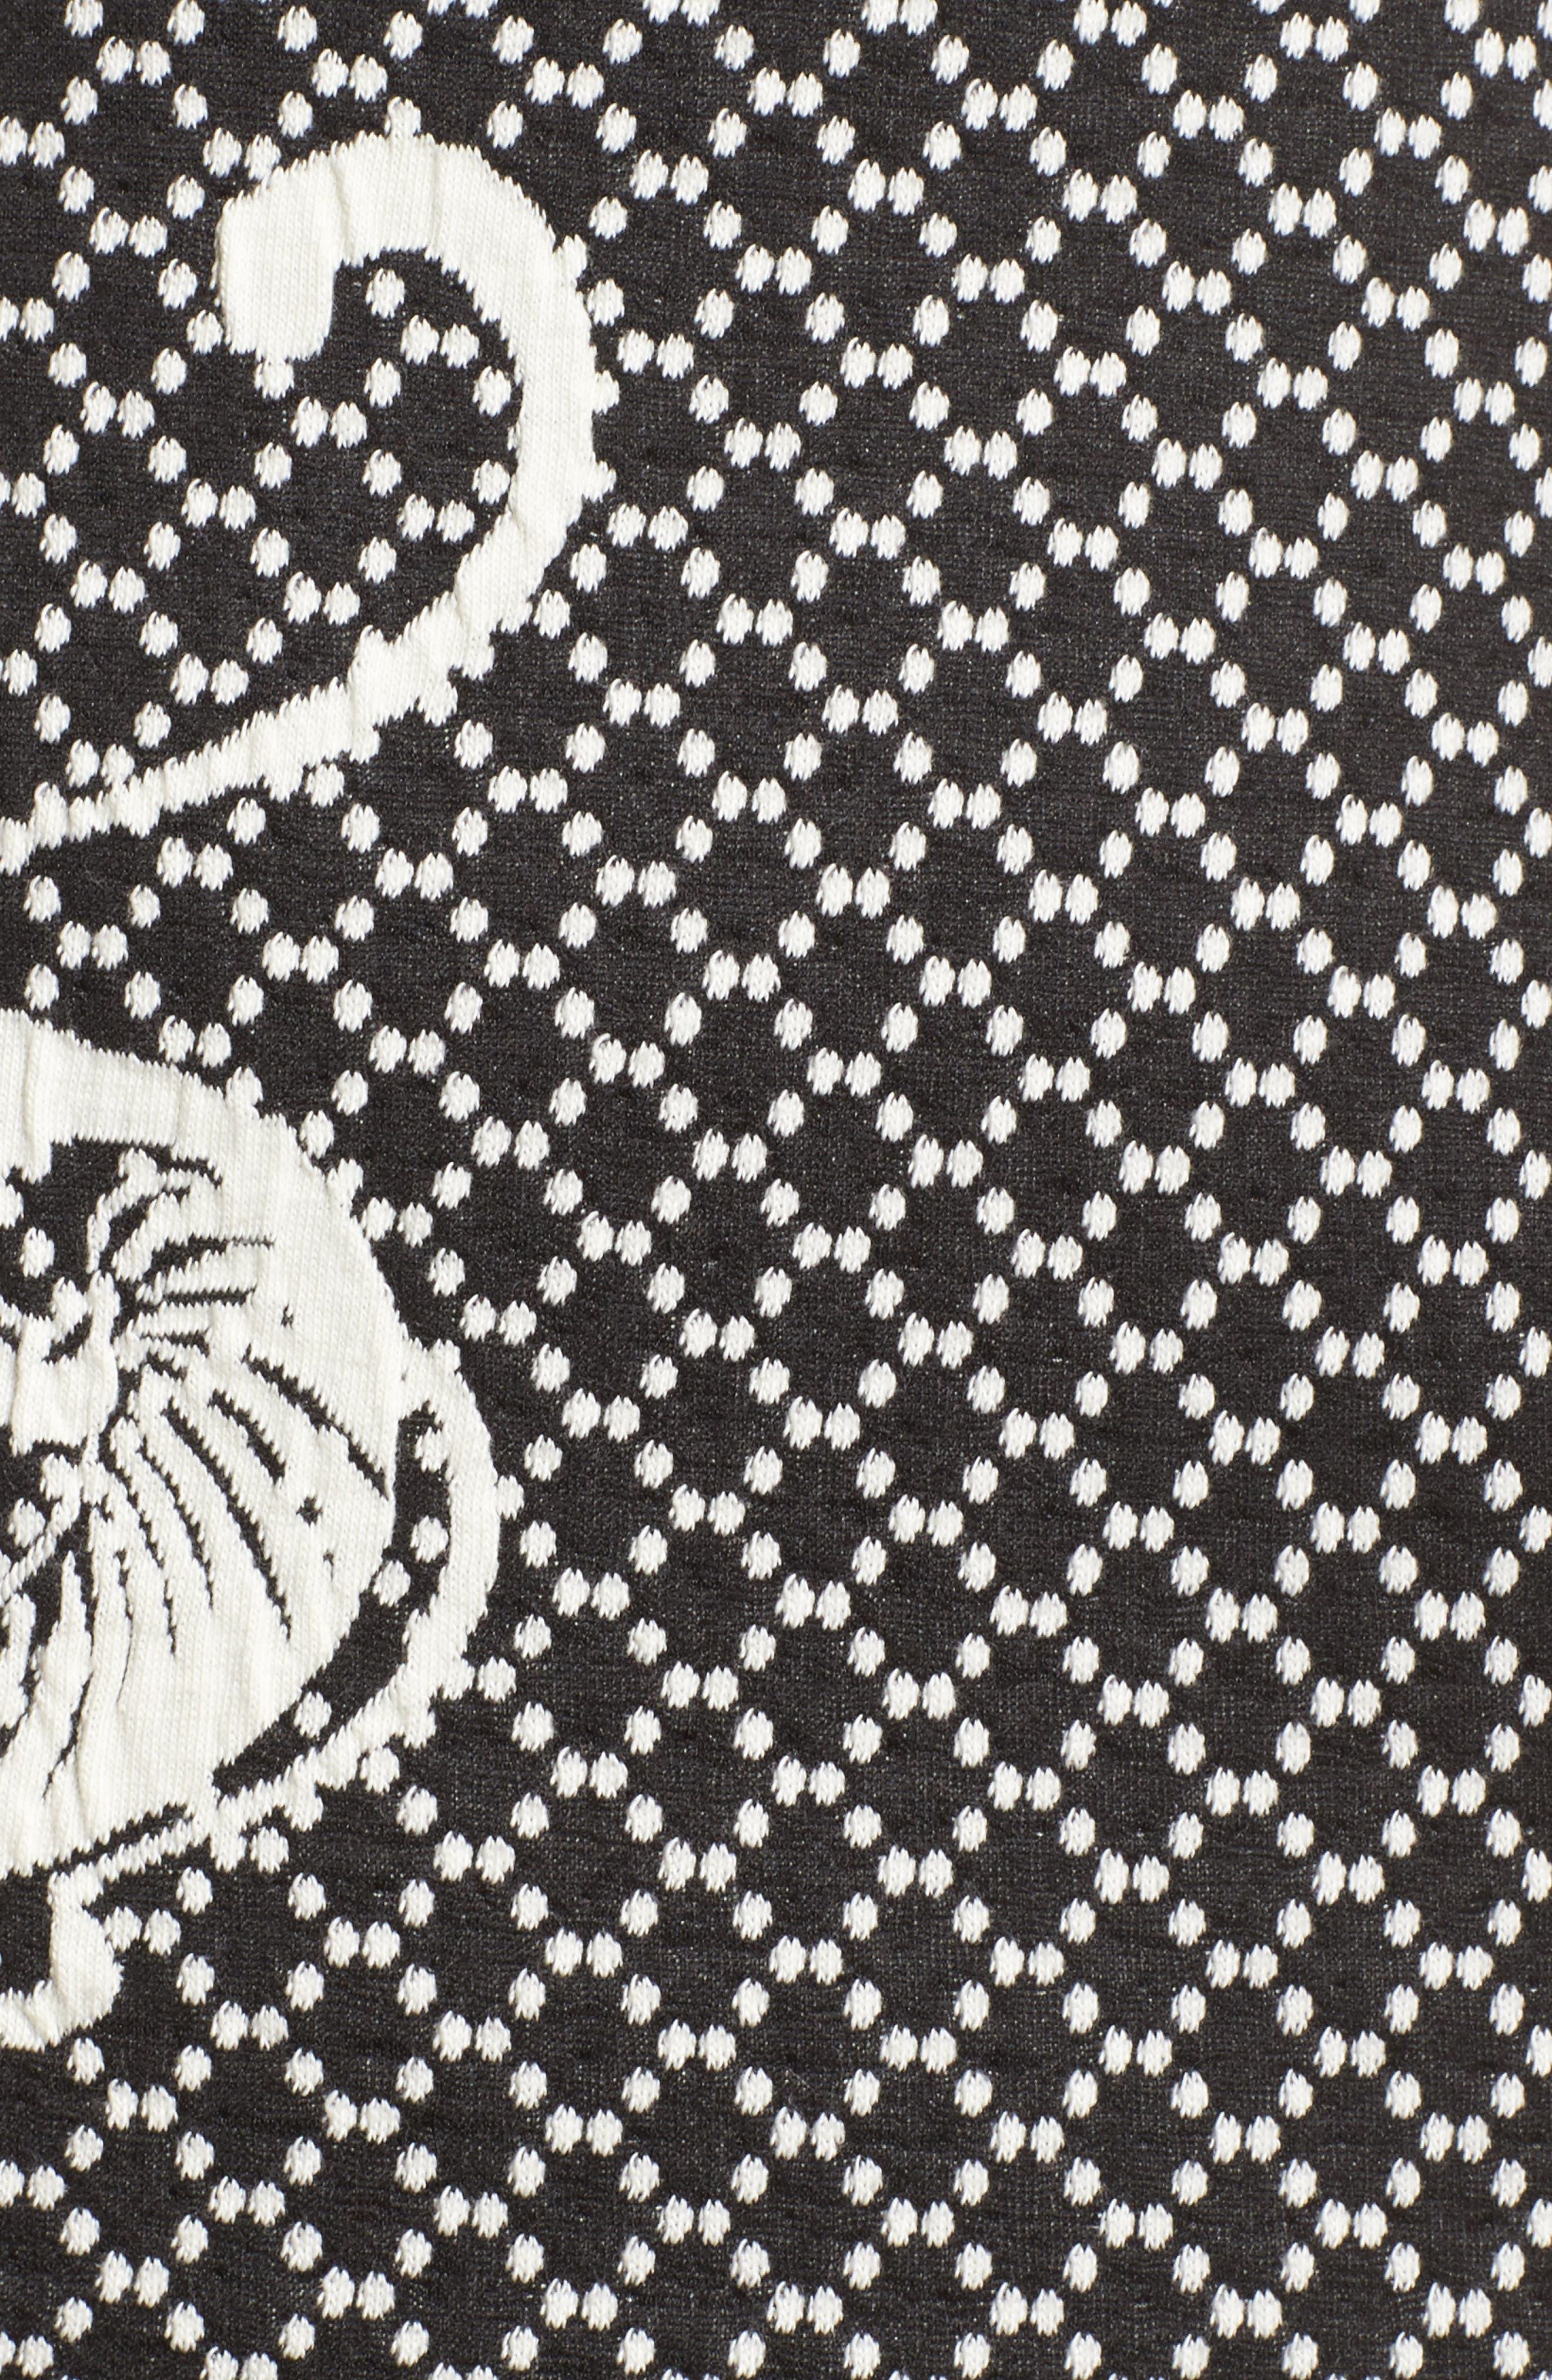 Scroll Border Knit Sheath,                             Alternate thumbnail 5, color,                             Black/ Ivory